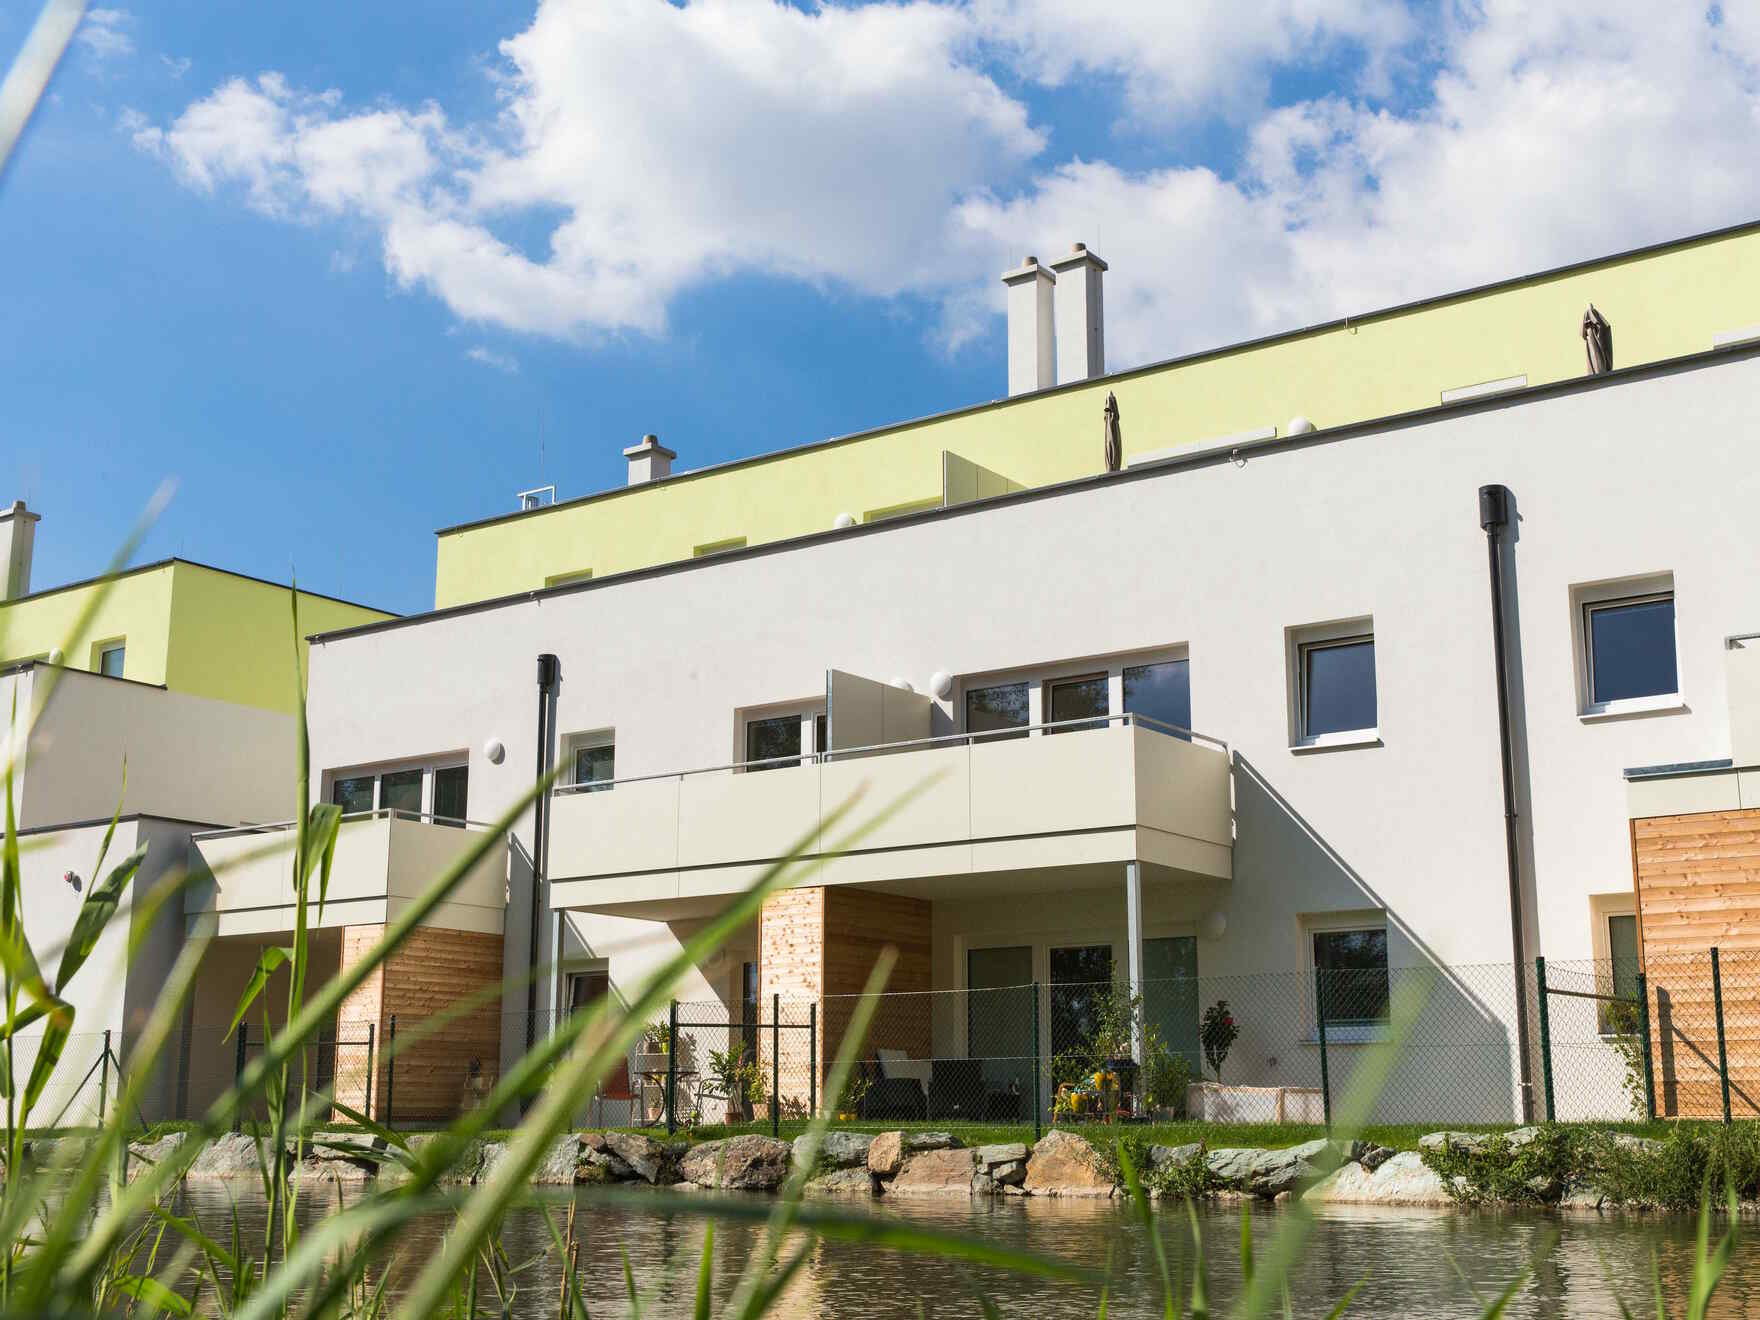 casa prefabbricata in legno Wohnhausanlage Eggendorf